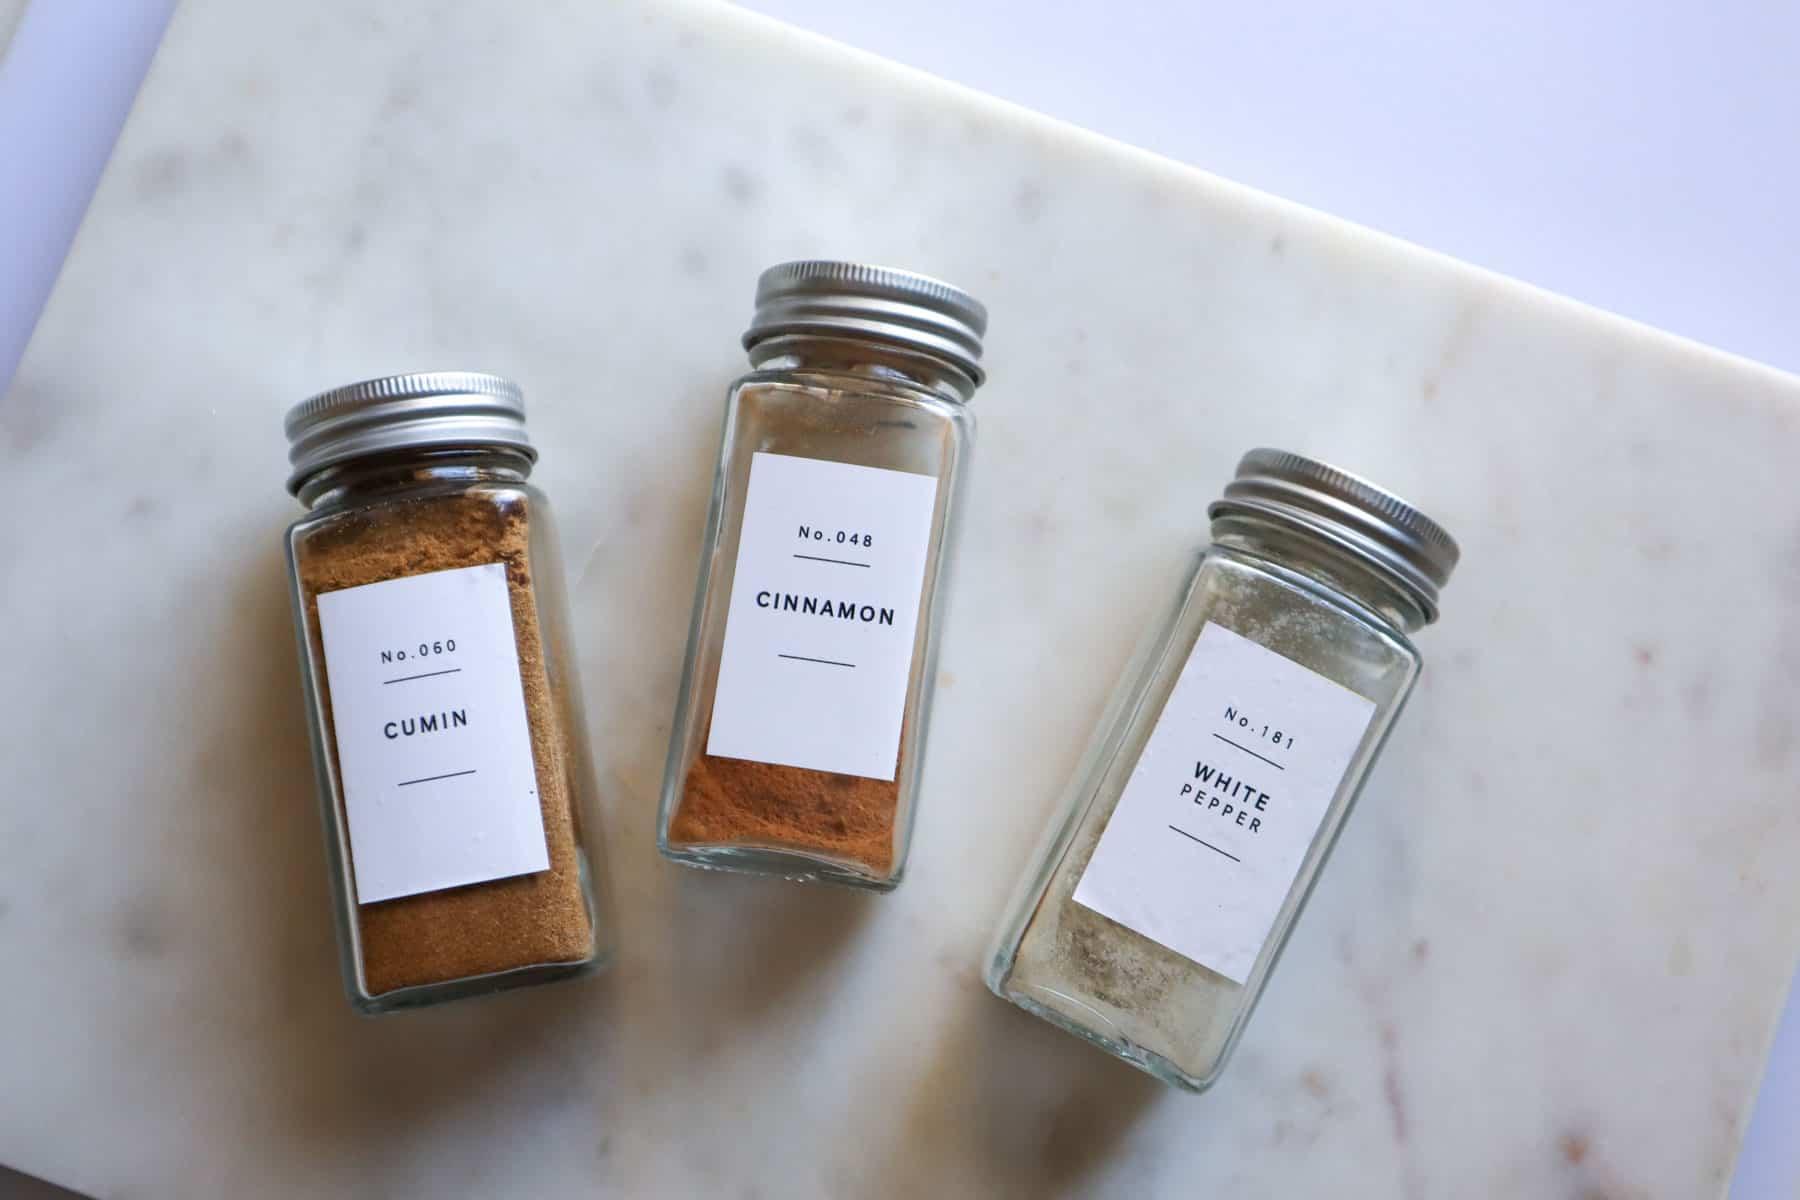 ground cumin, ground cinnamon, and ground white pepper in separate spice jars